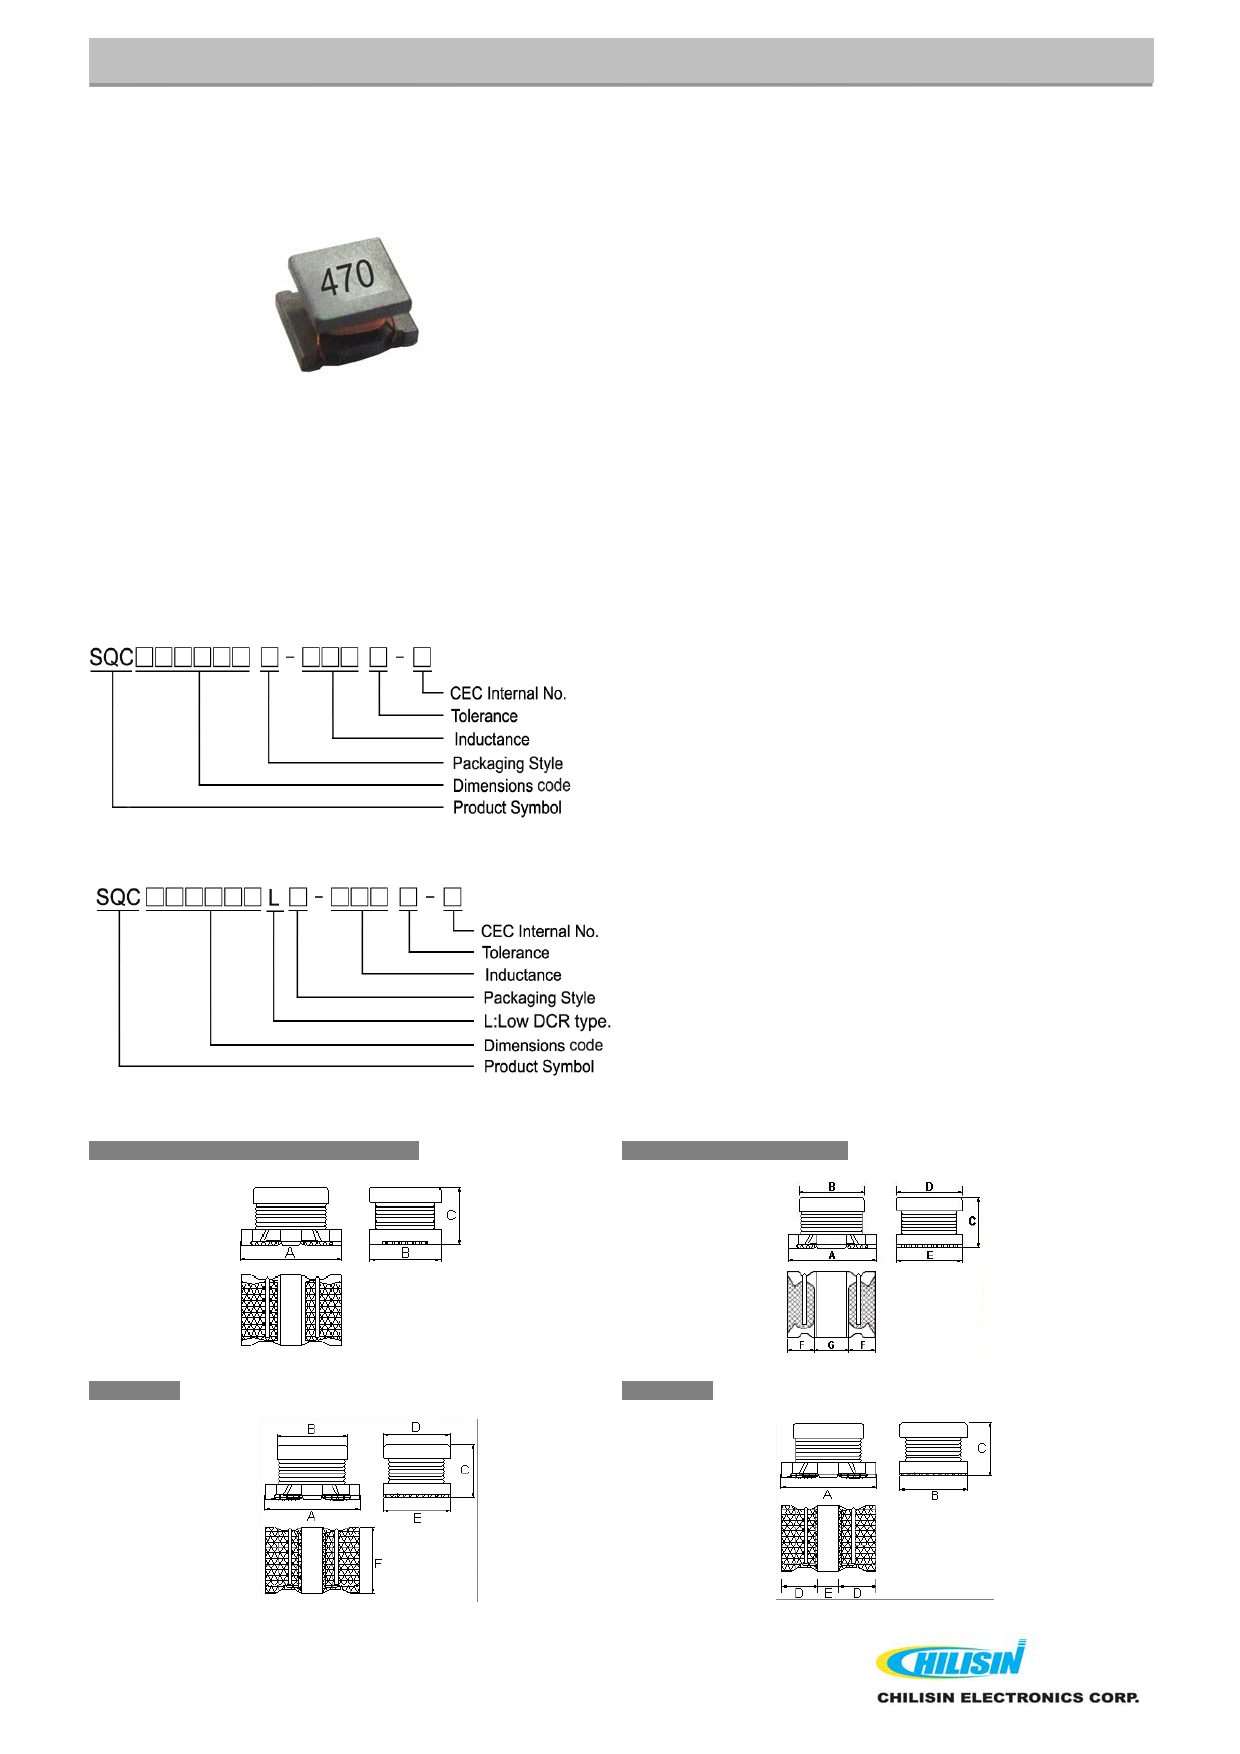 SQC453226 데이터시트 및 SQC453226 PDF